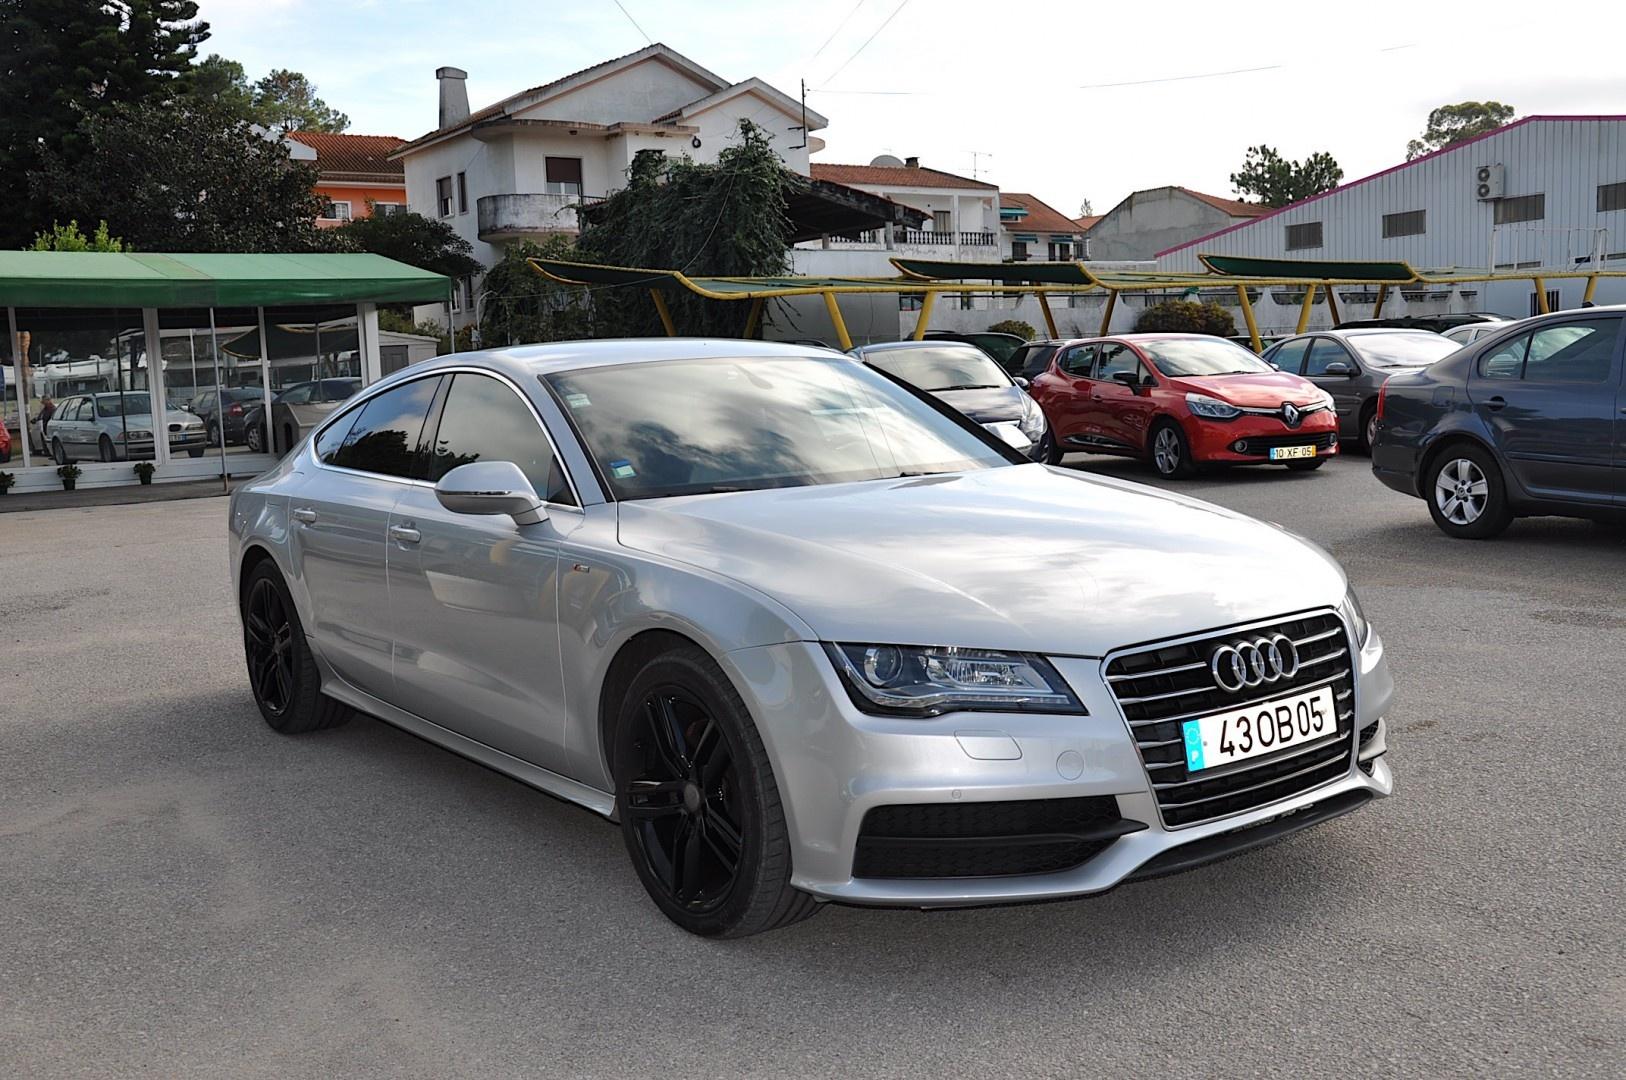 Audi A7 3.0Tdi V6 quattro S-line S tronic